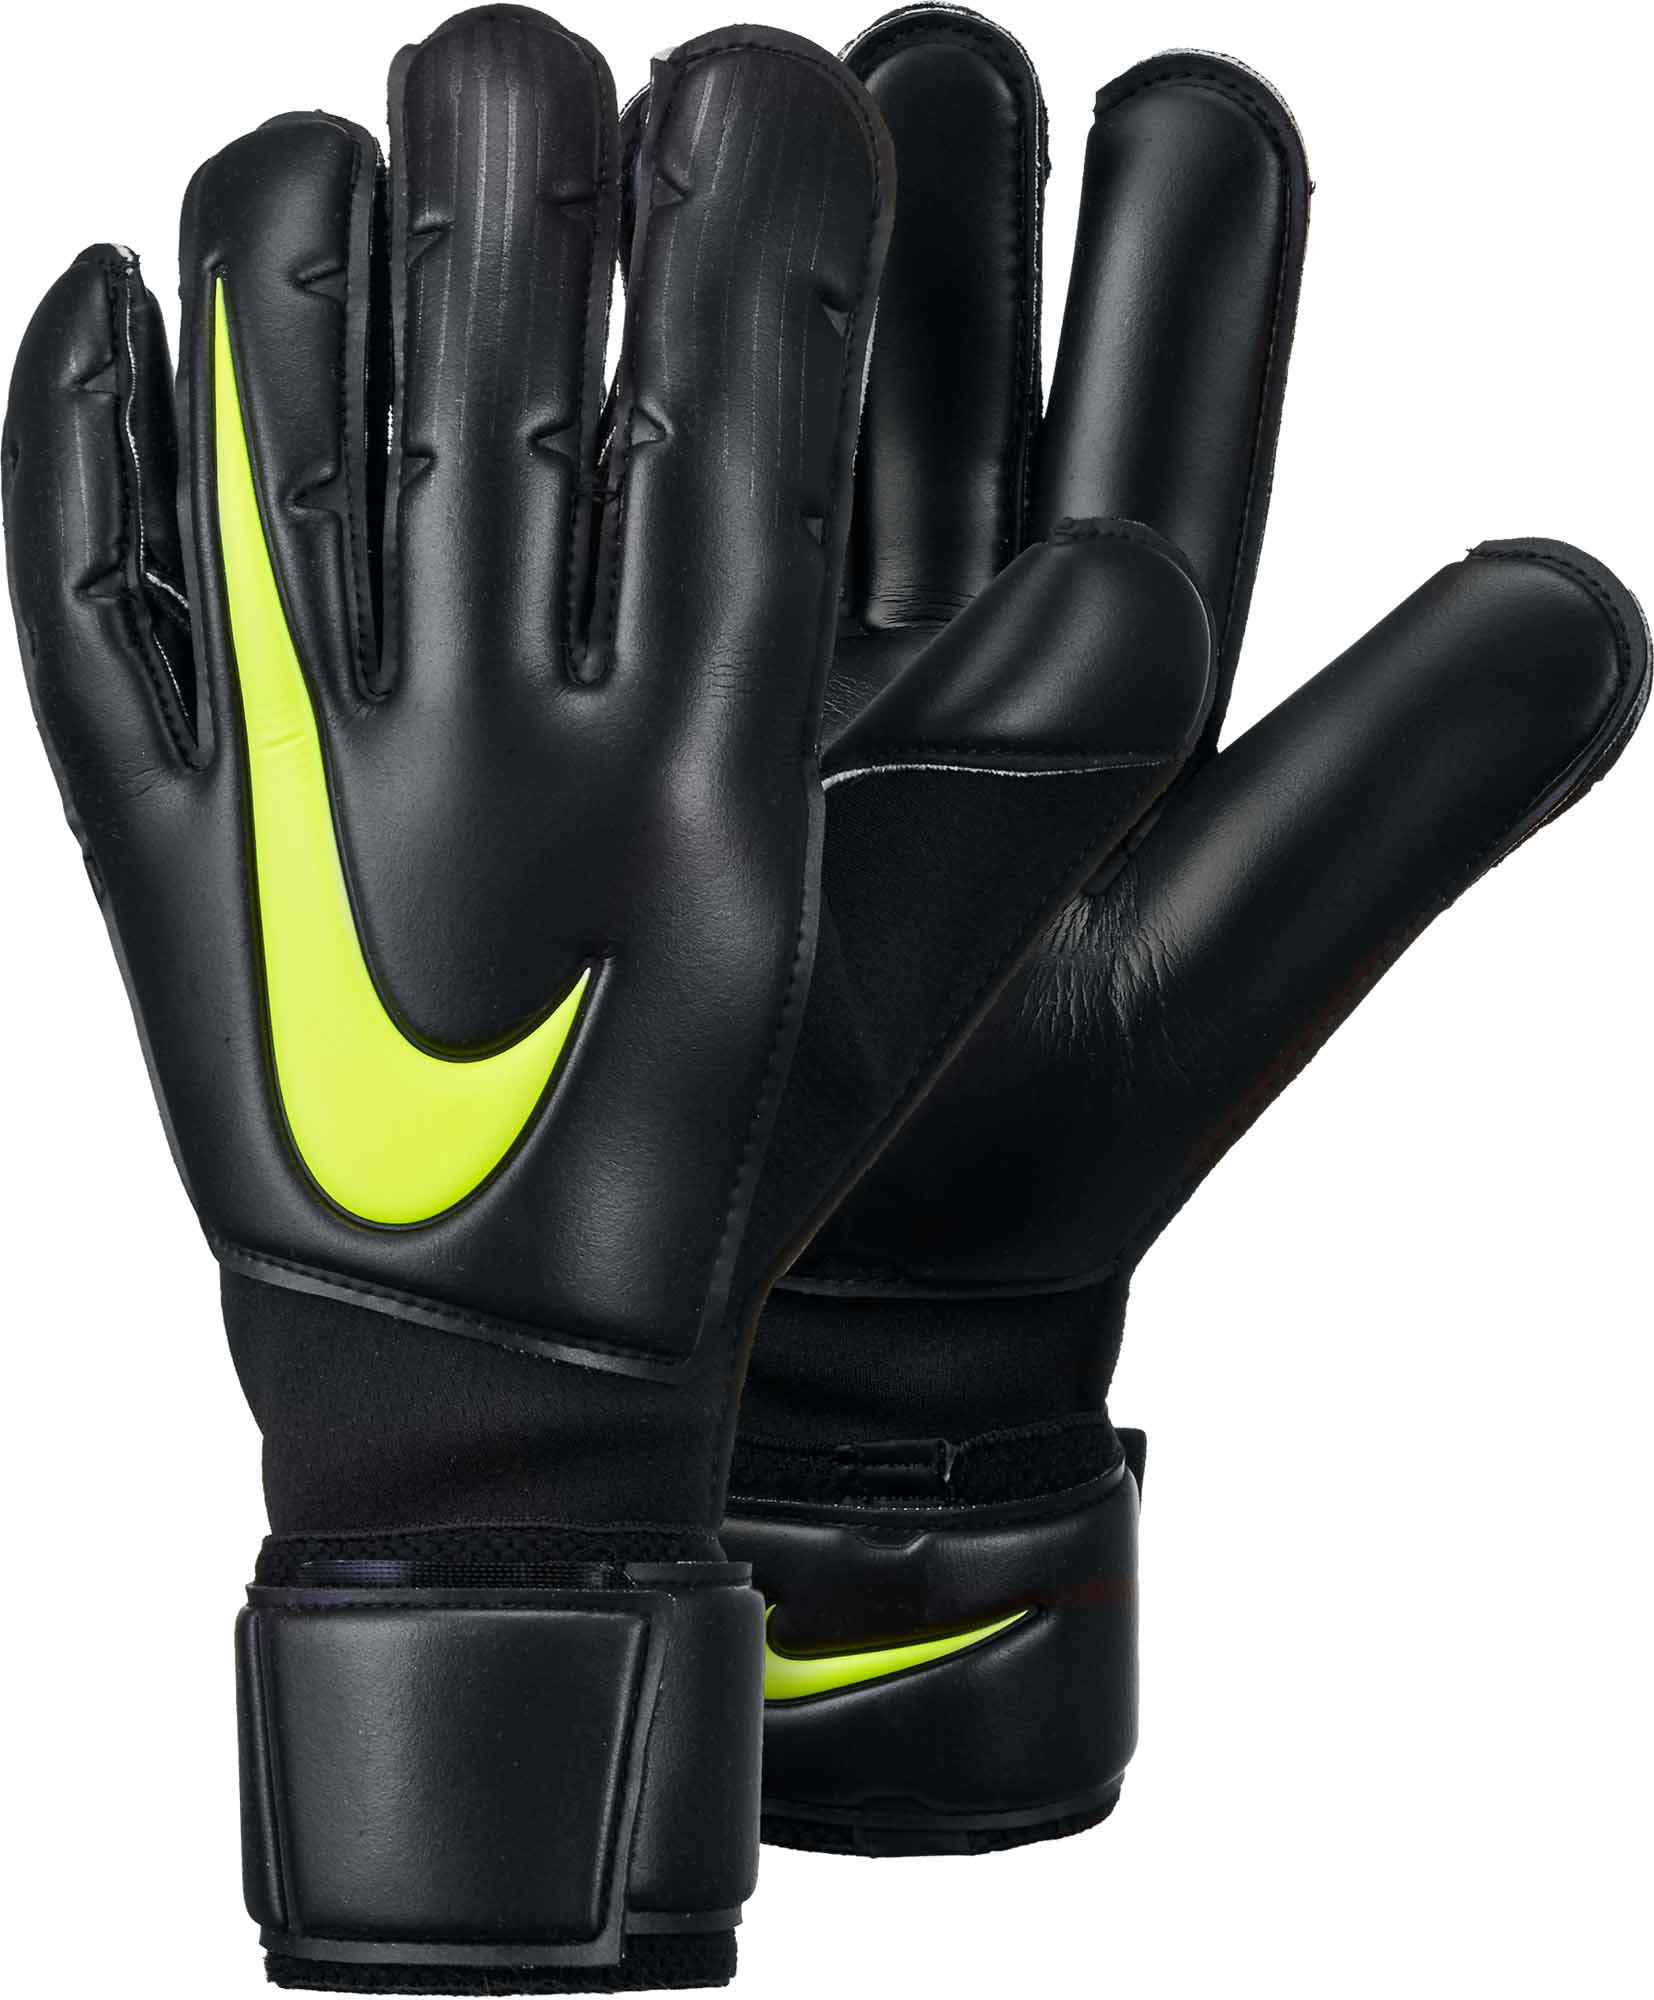 278e0fdec Nike Vapor Grip3 Goalkeeper Gloves - Black/Volt - SoccerPro.com